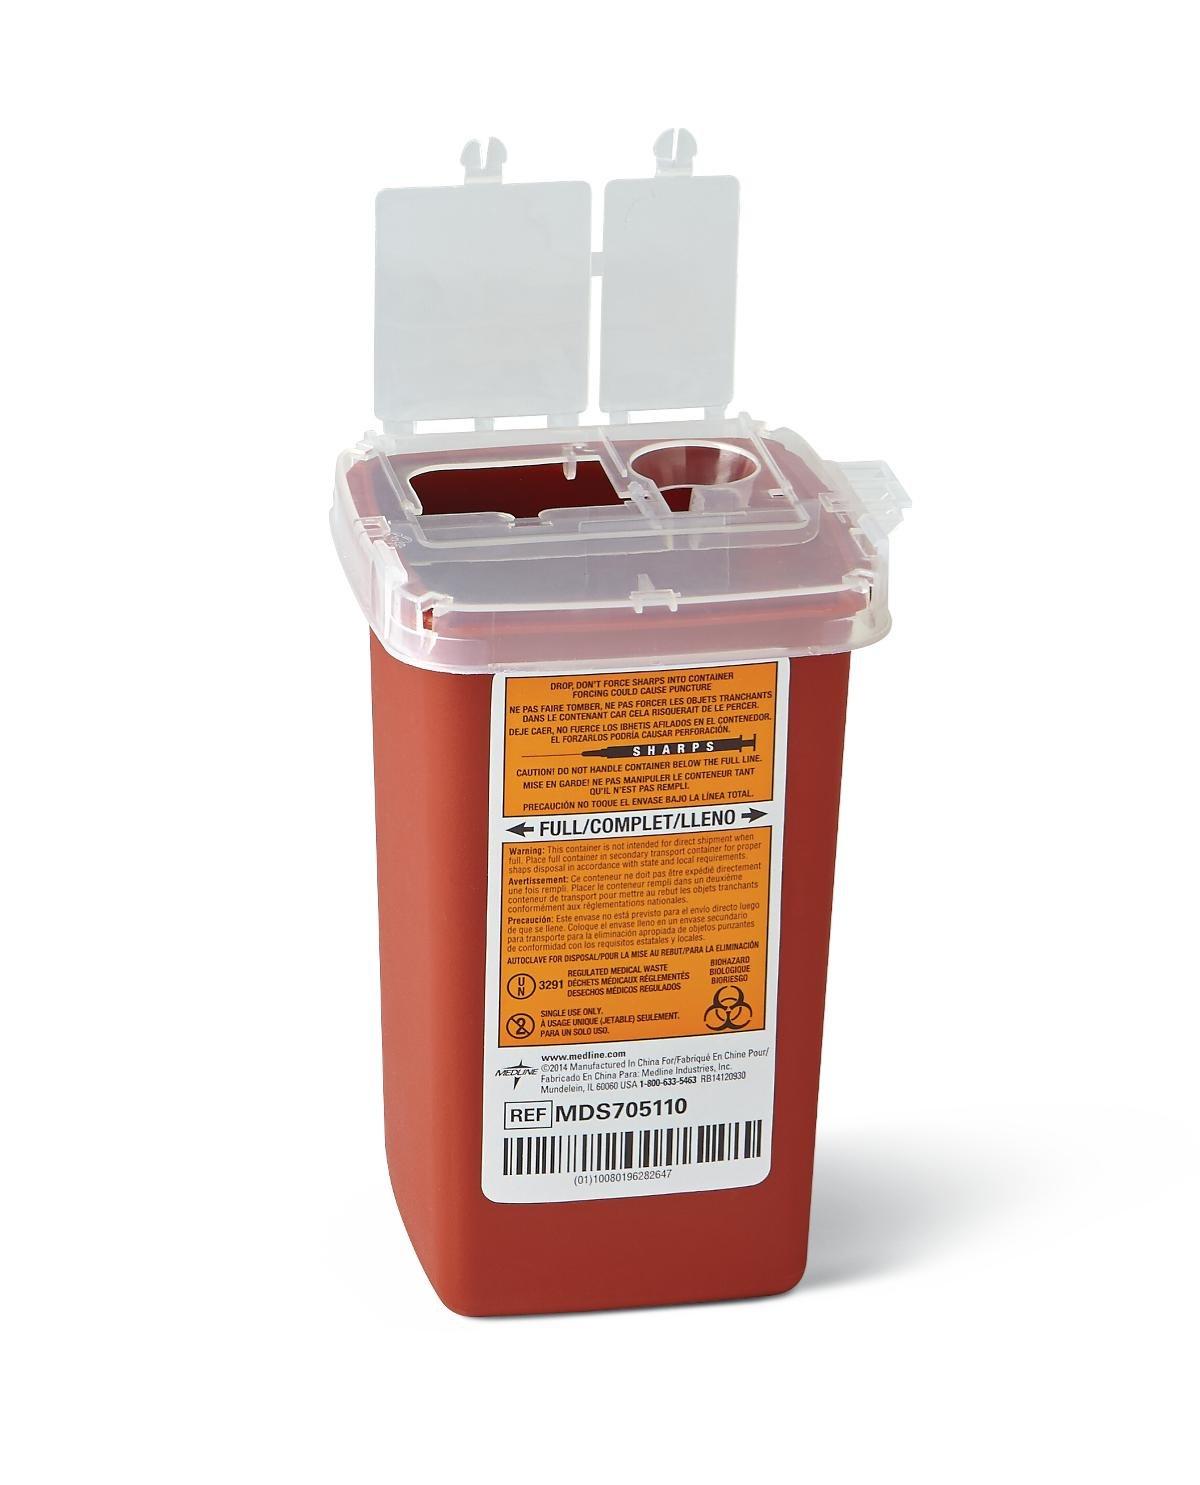 Medline Sharps Container, Bio-hazard Needle Disposal Container, 1 Quart (100 Pack) by Medline